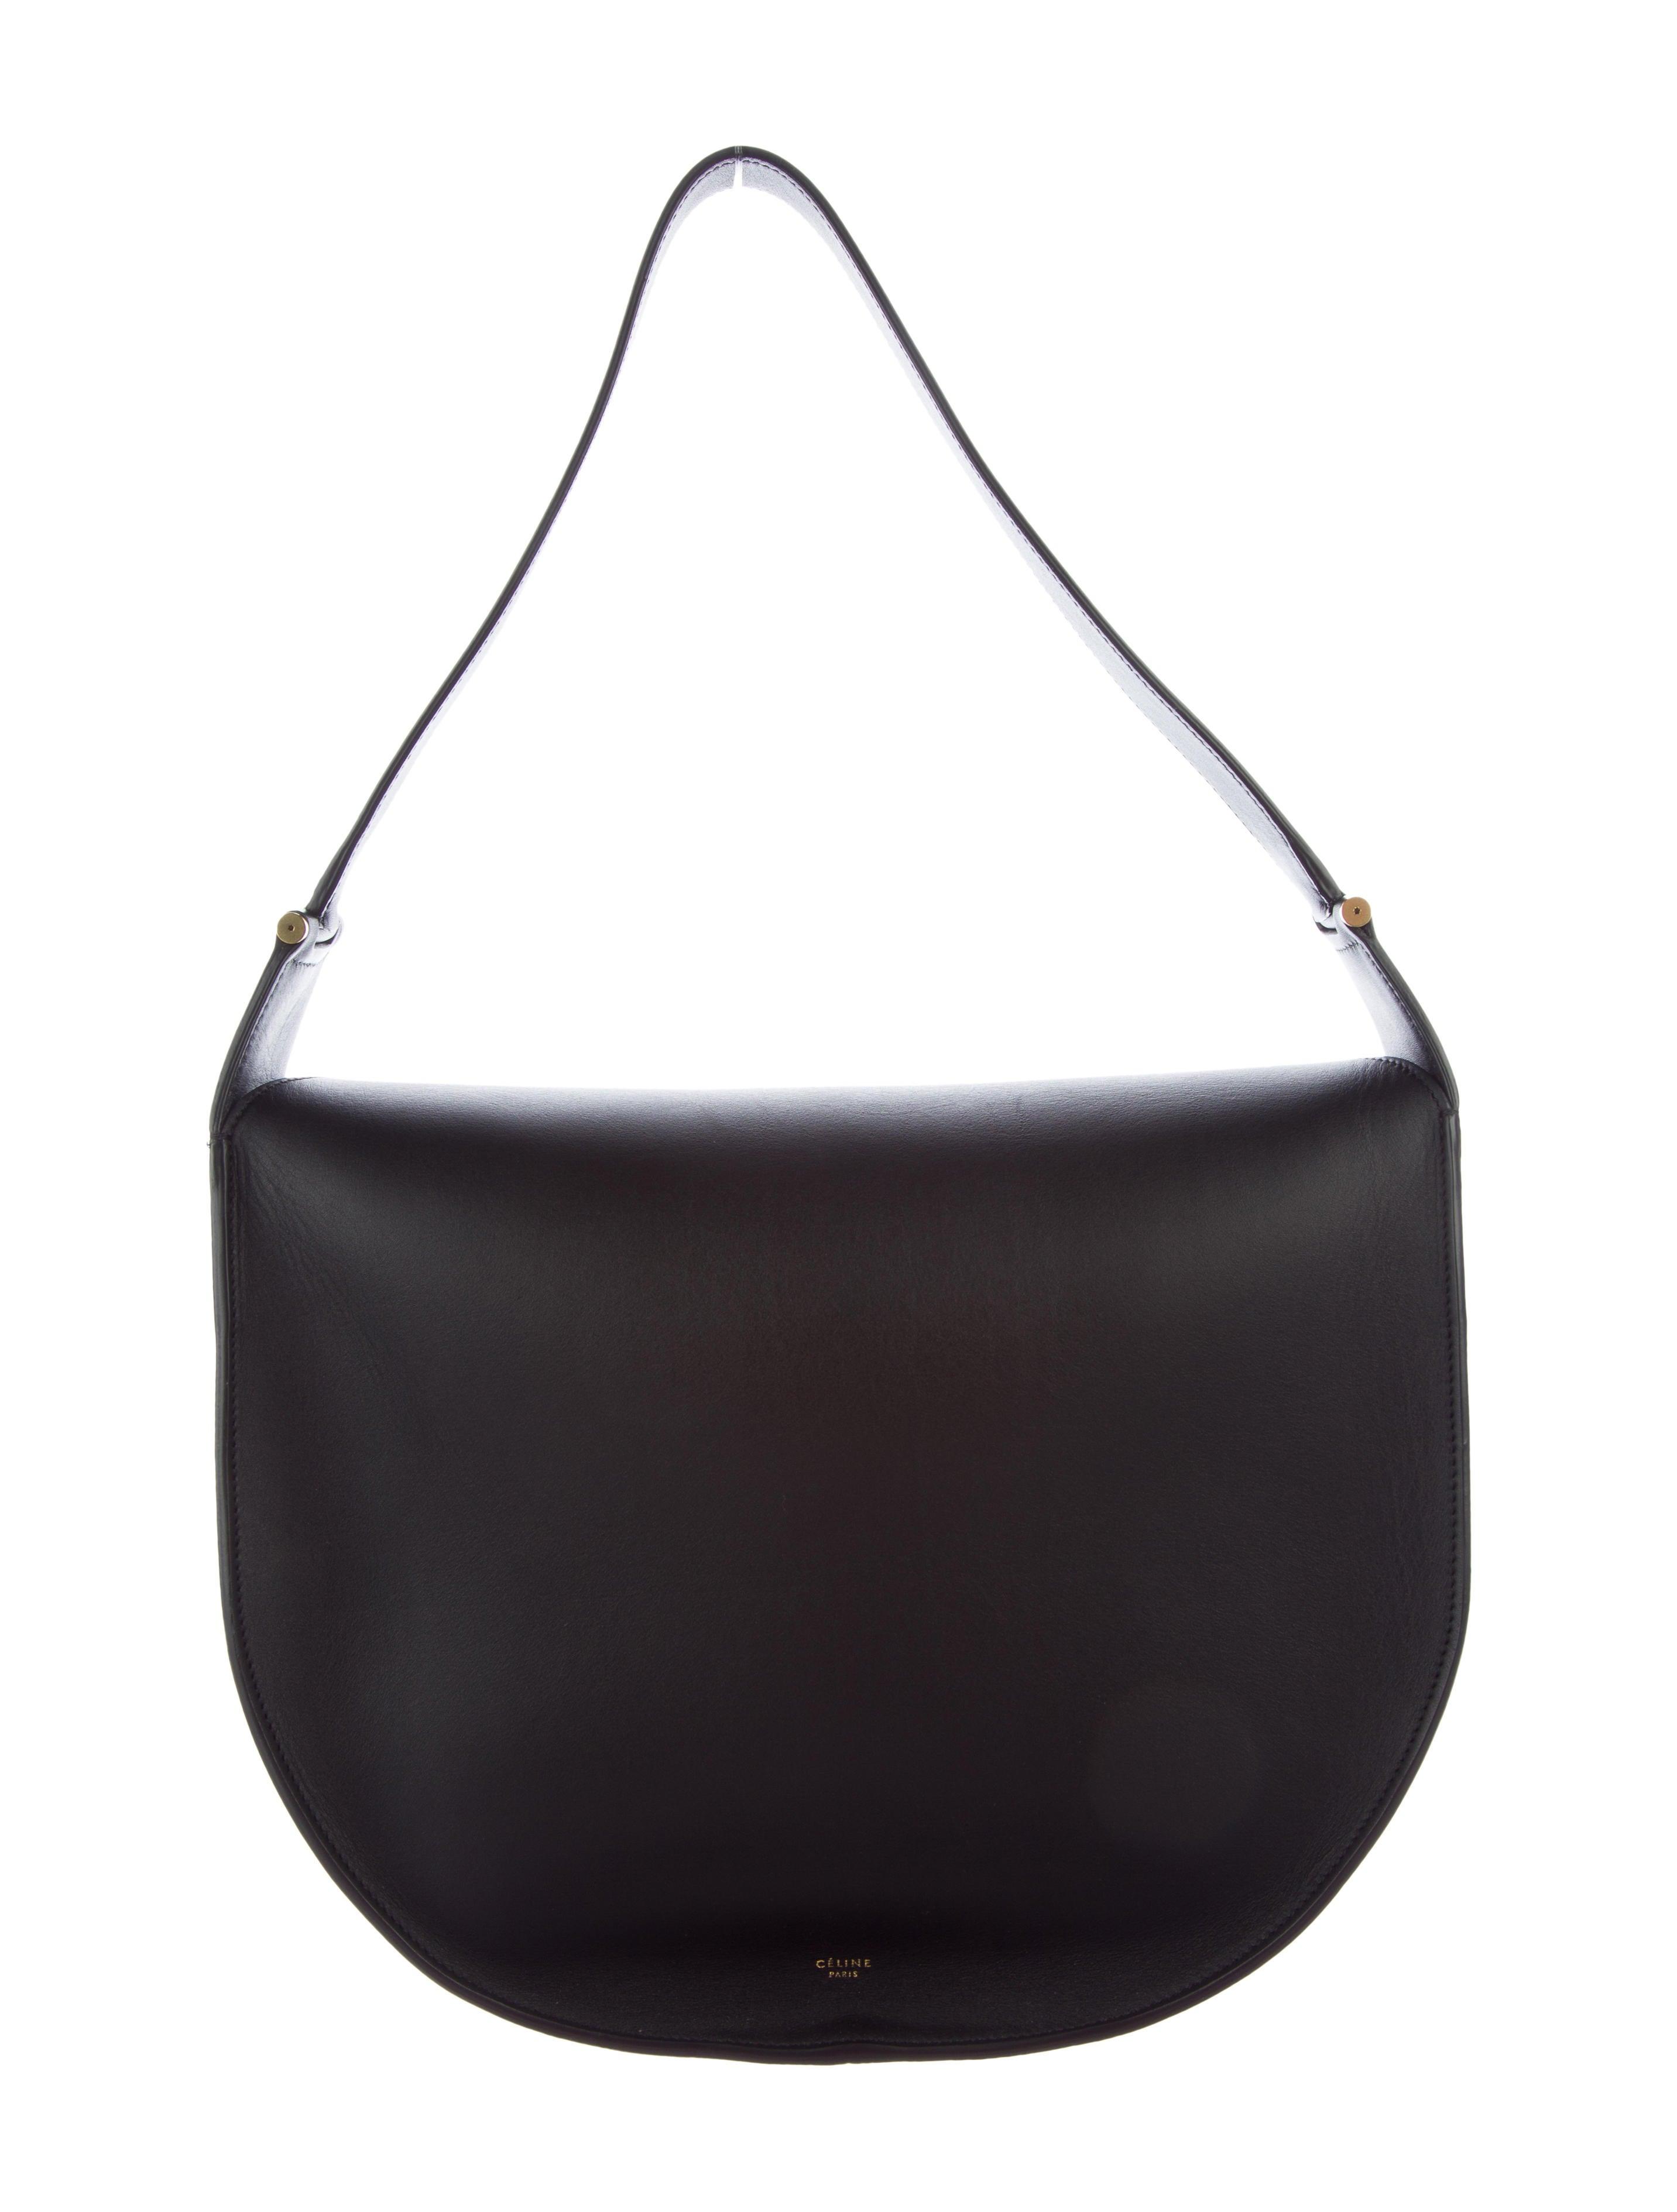 Celine Cel55163 Round Céline Handbags 2016 Bag Flap AL5j3R4